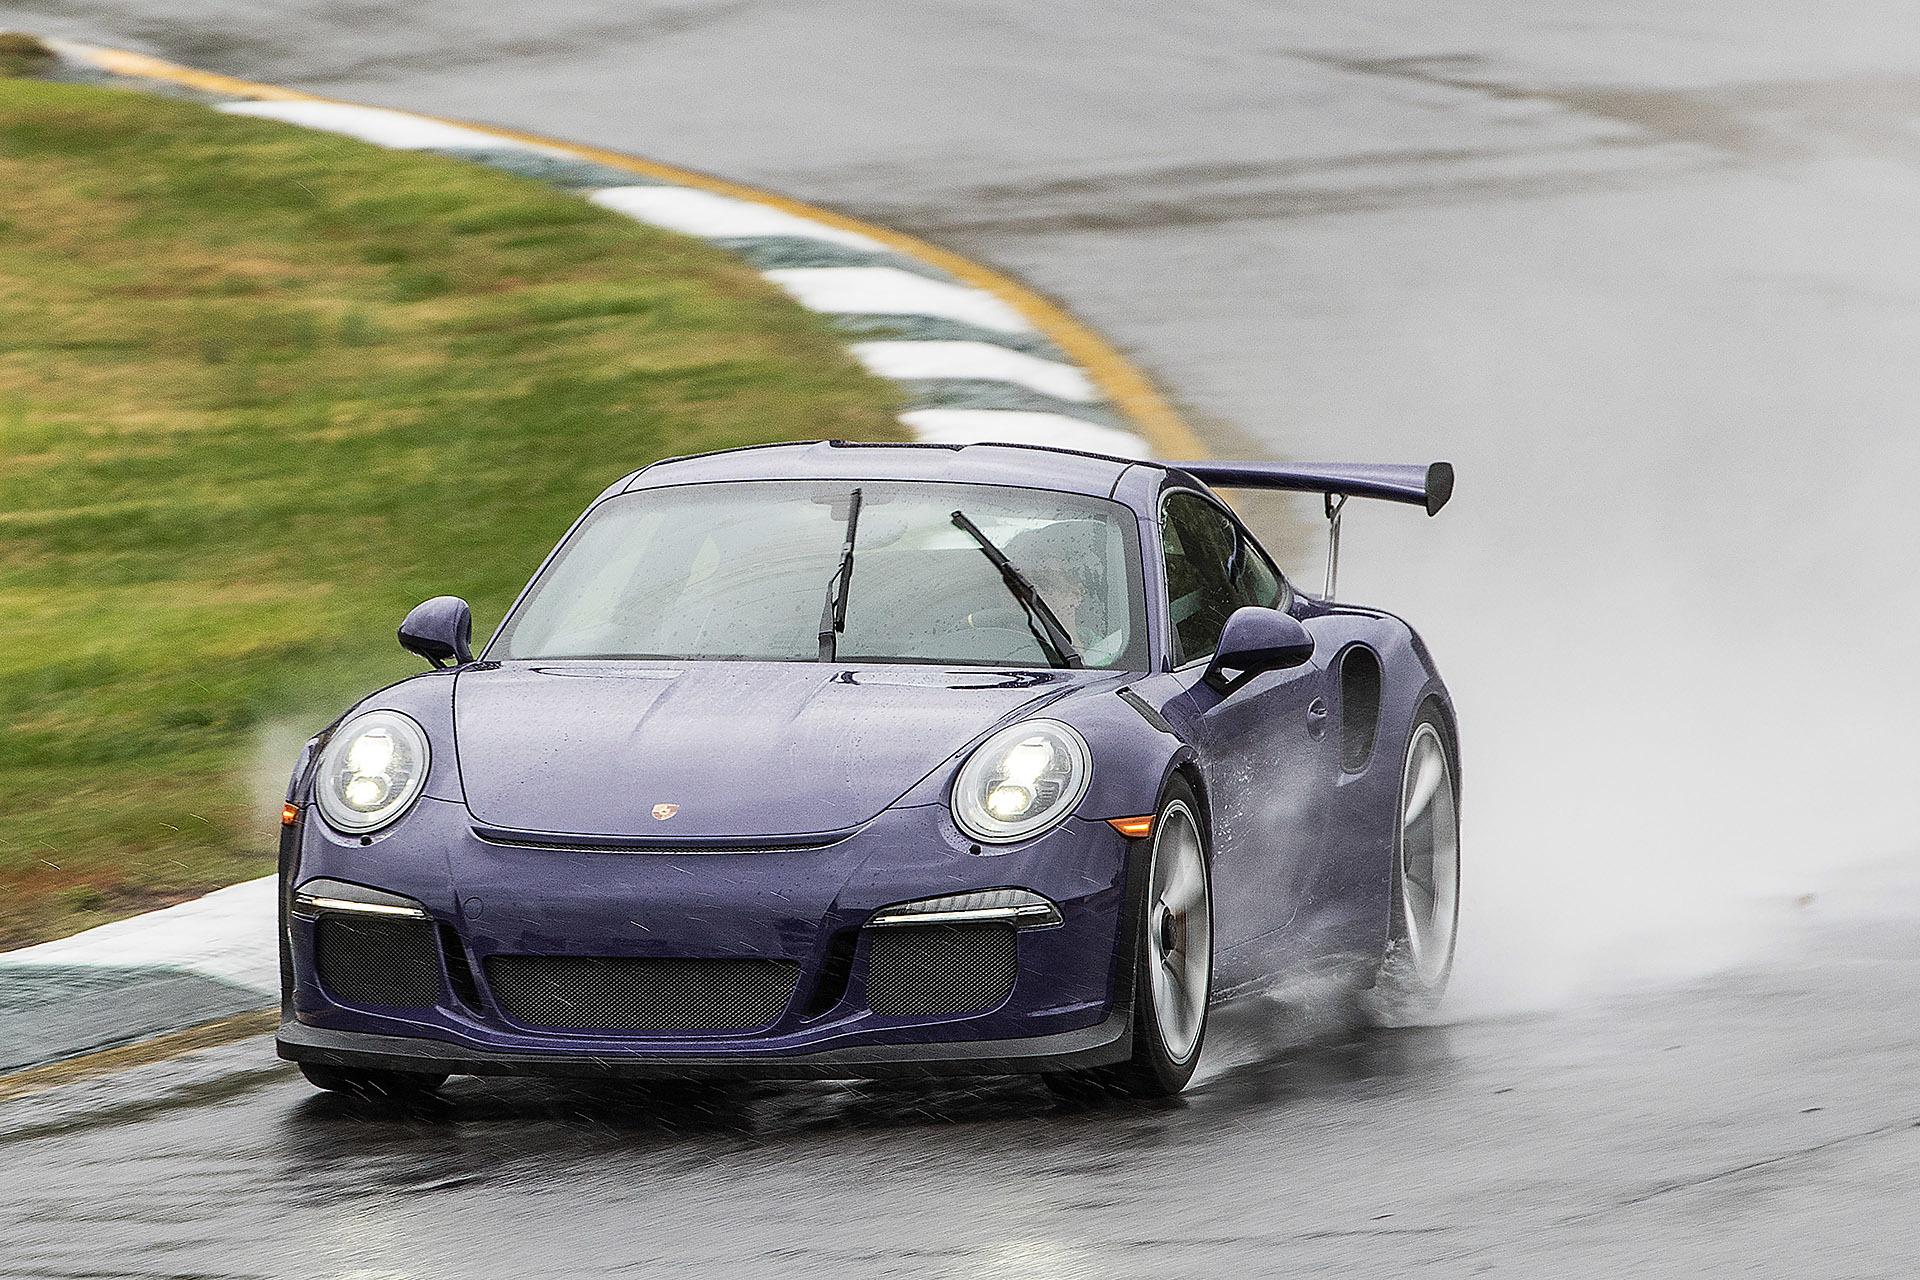 500 Horses 2016 Porsche 911 GT3 RS 4